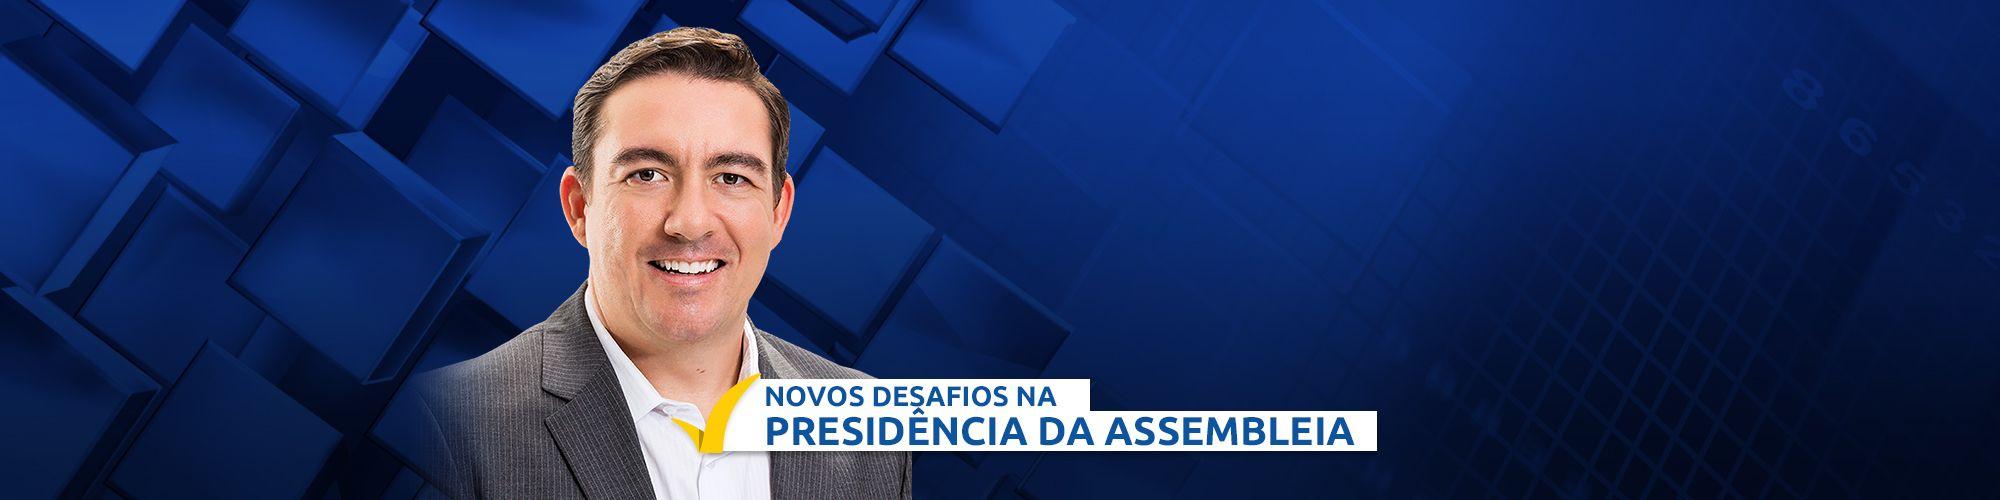 Banner de Presidência da Assembleia